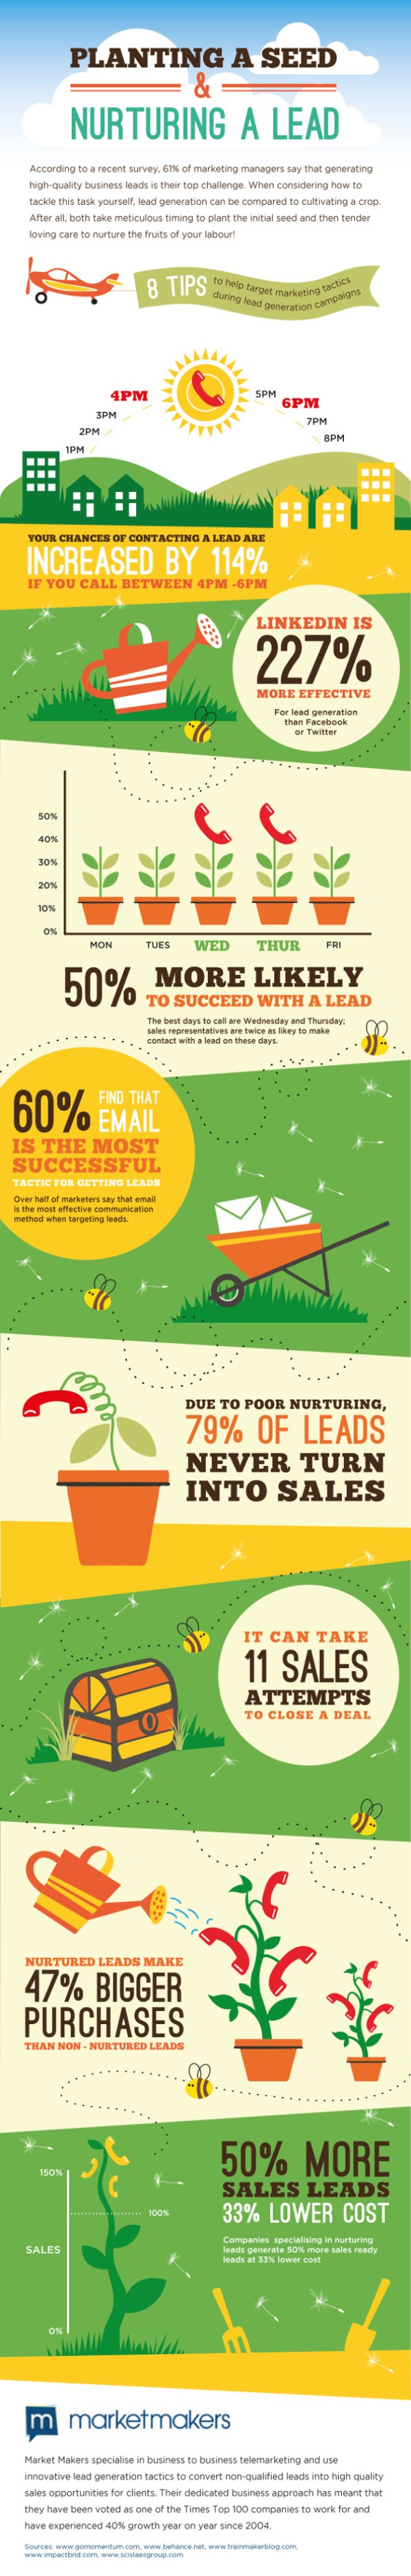 Lead Nurturing Stats-Infographic